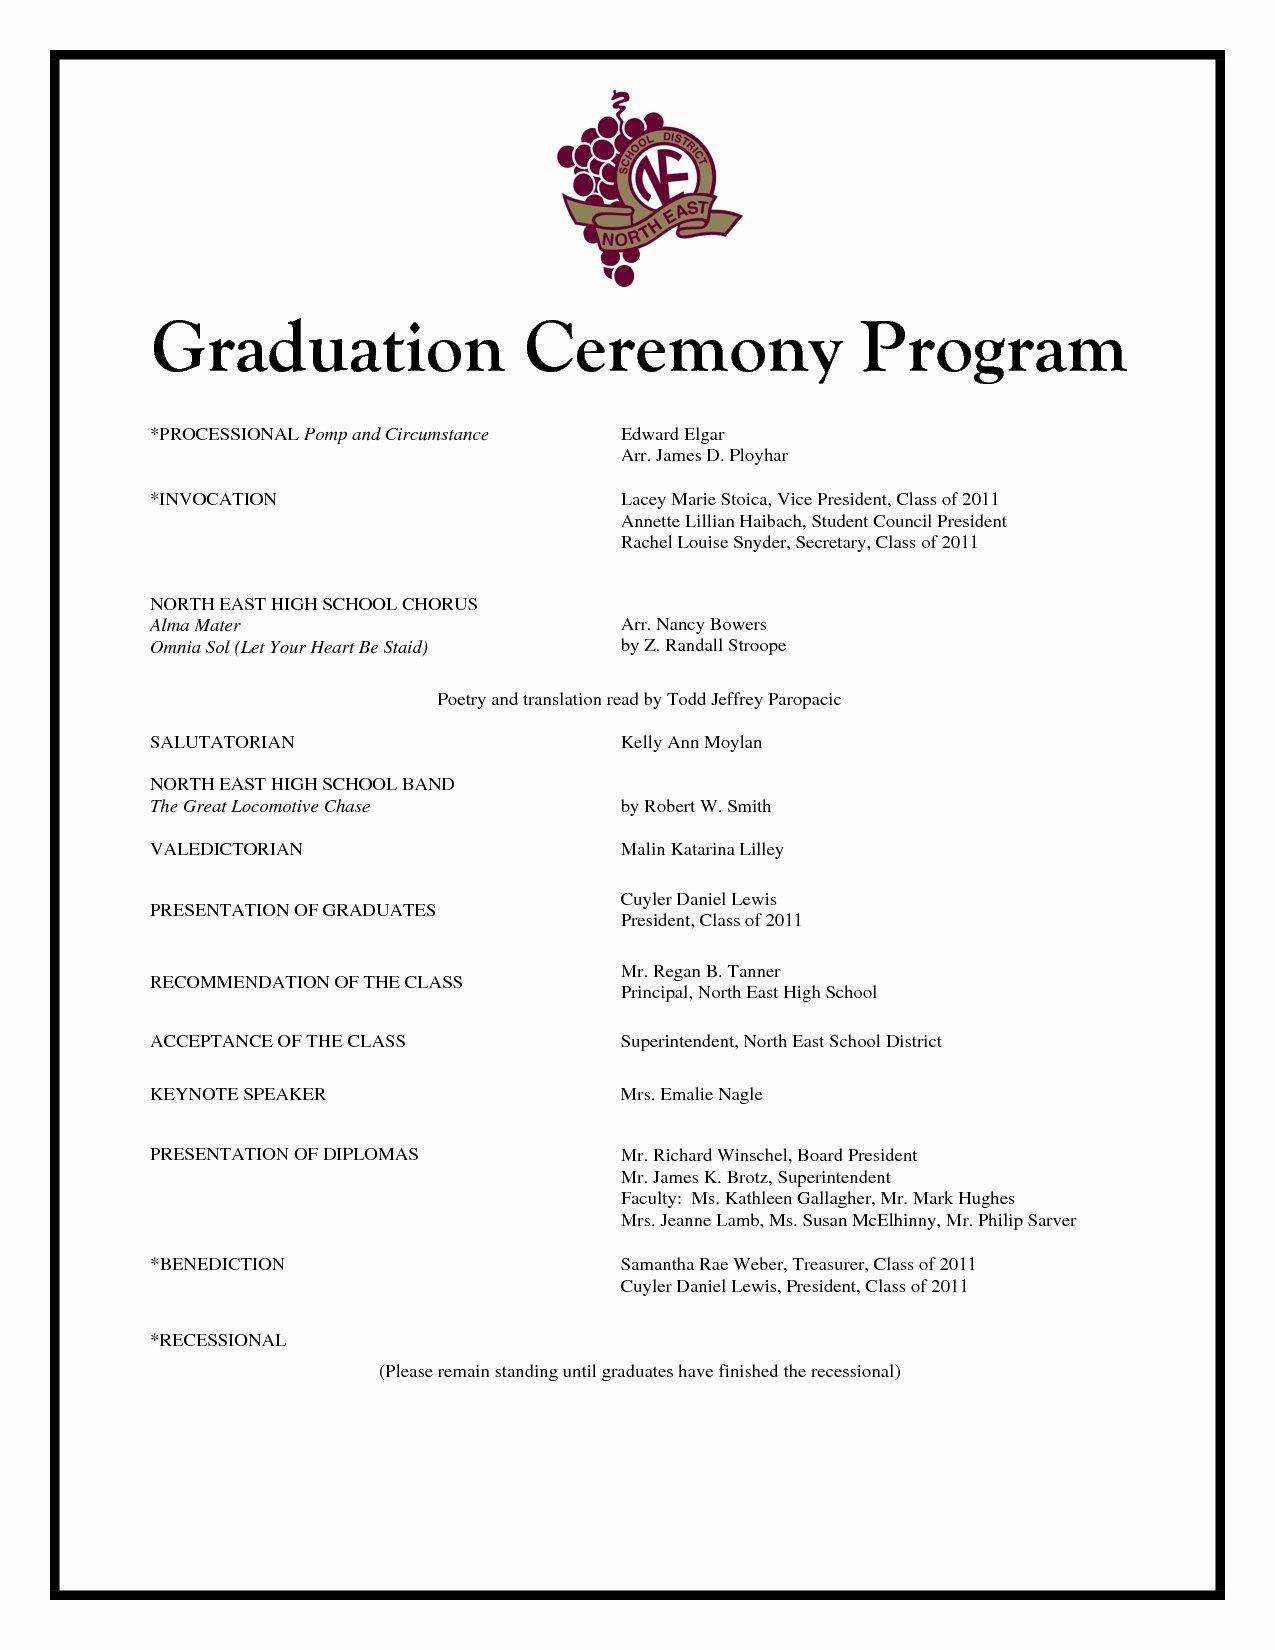 Graduation Ceremony Program Sample